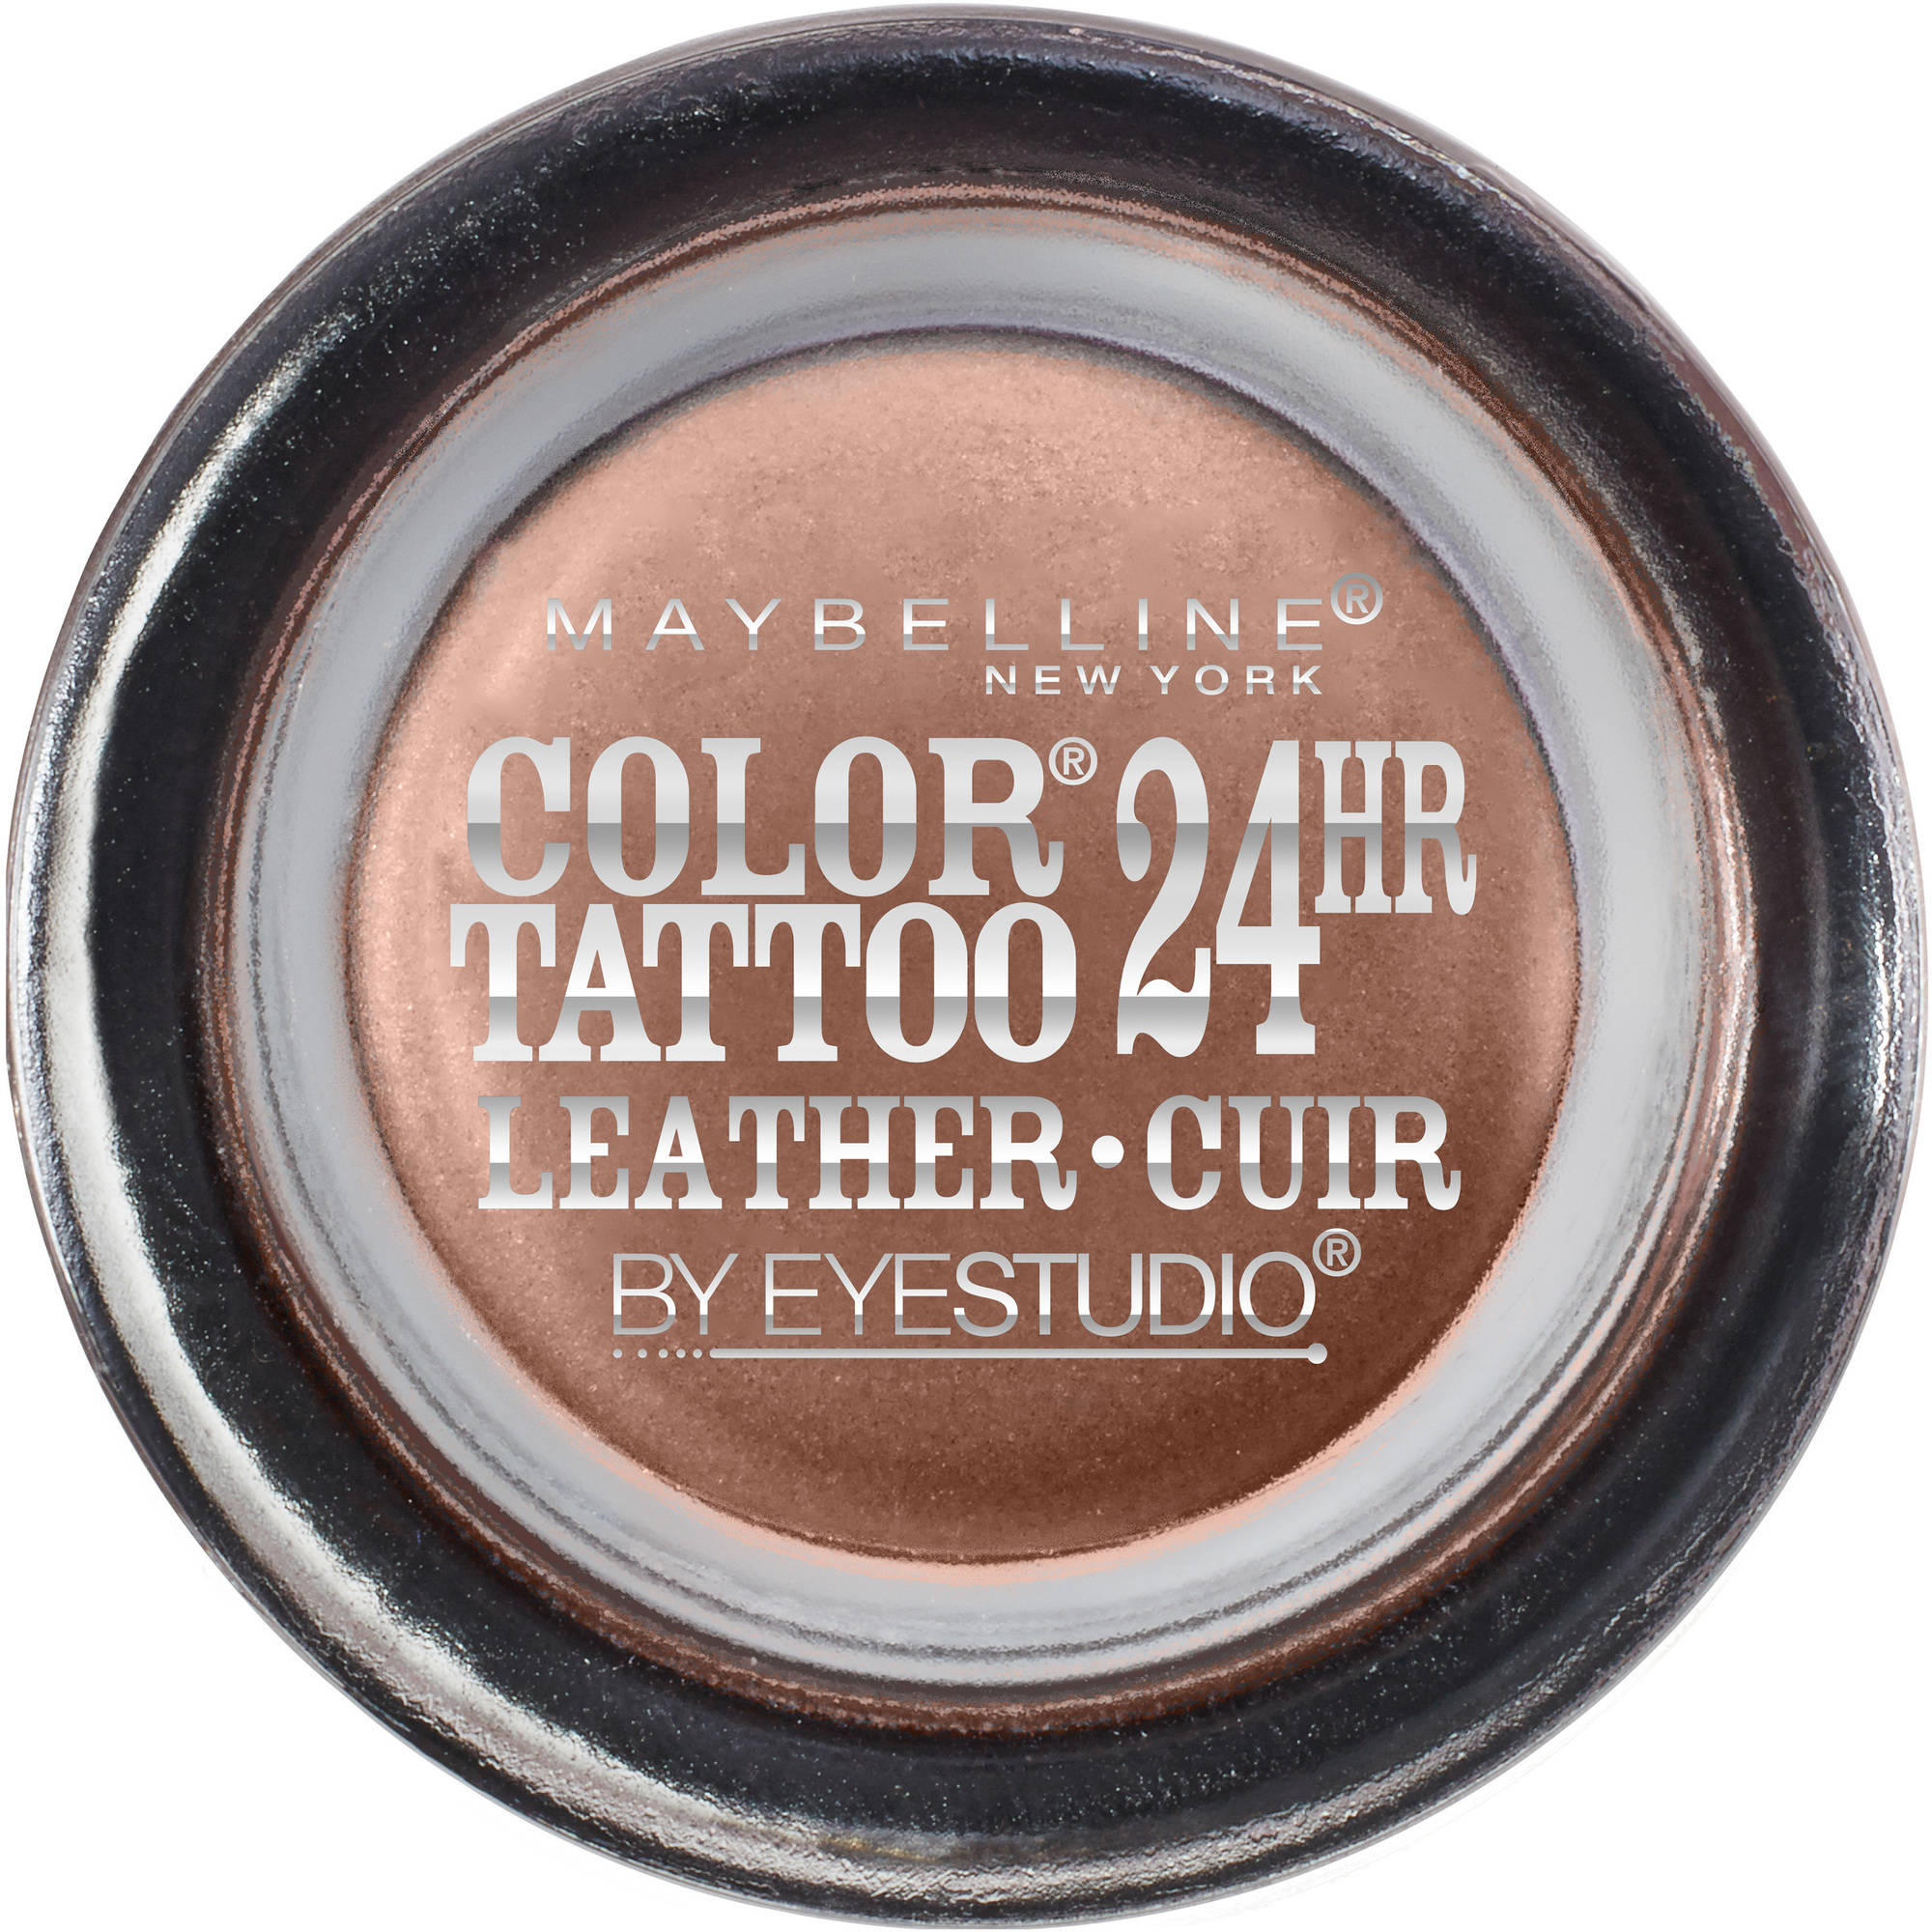 Maybelline New York Eye Studio Color Tattoo Leather 24HR Eyeshadow